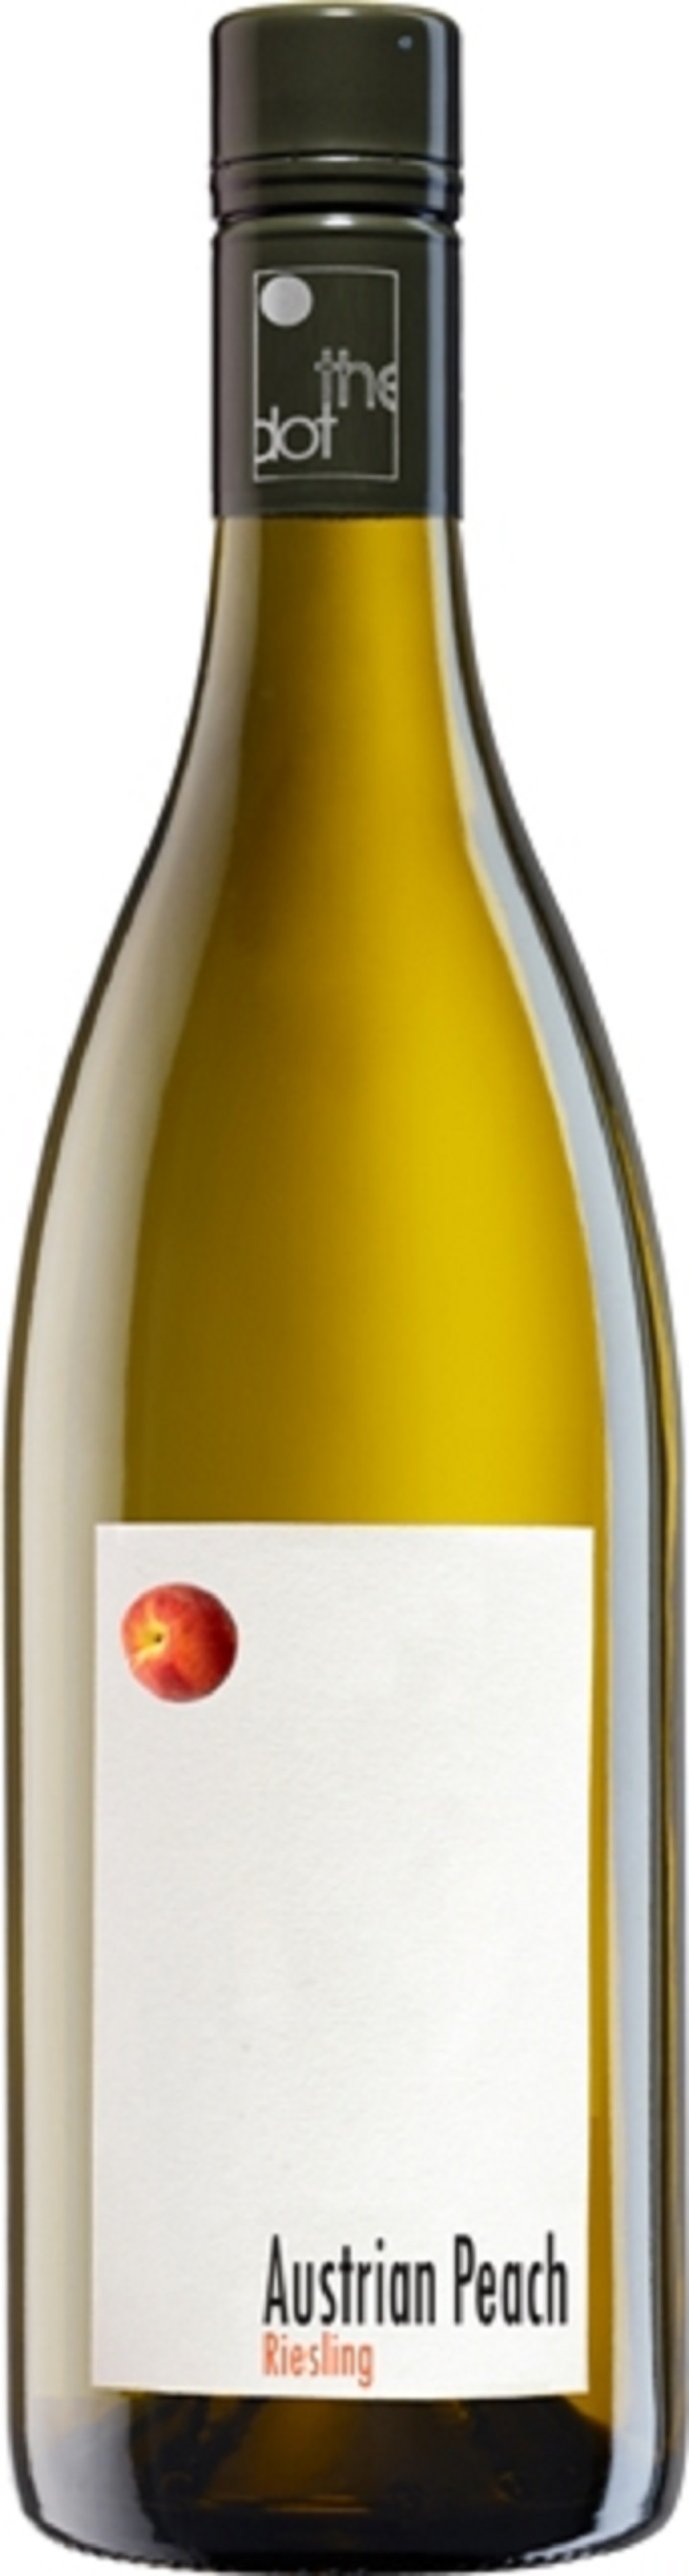 Weingut Pfaffl Austrian Peach Riesling